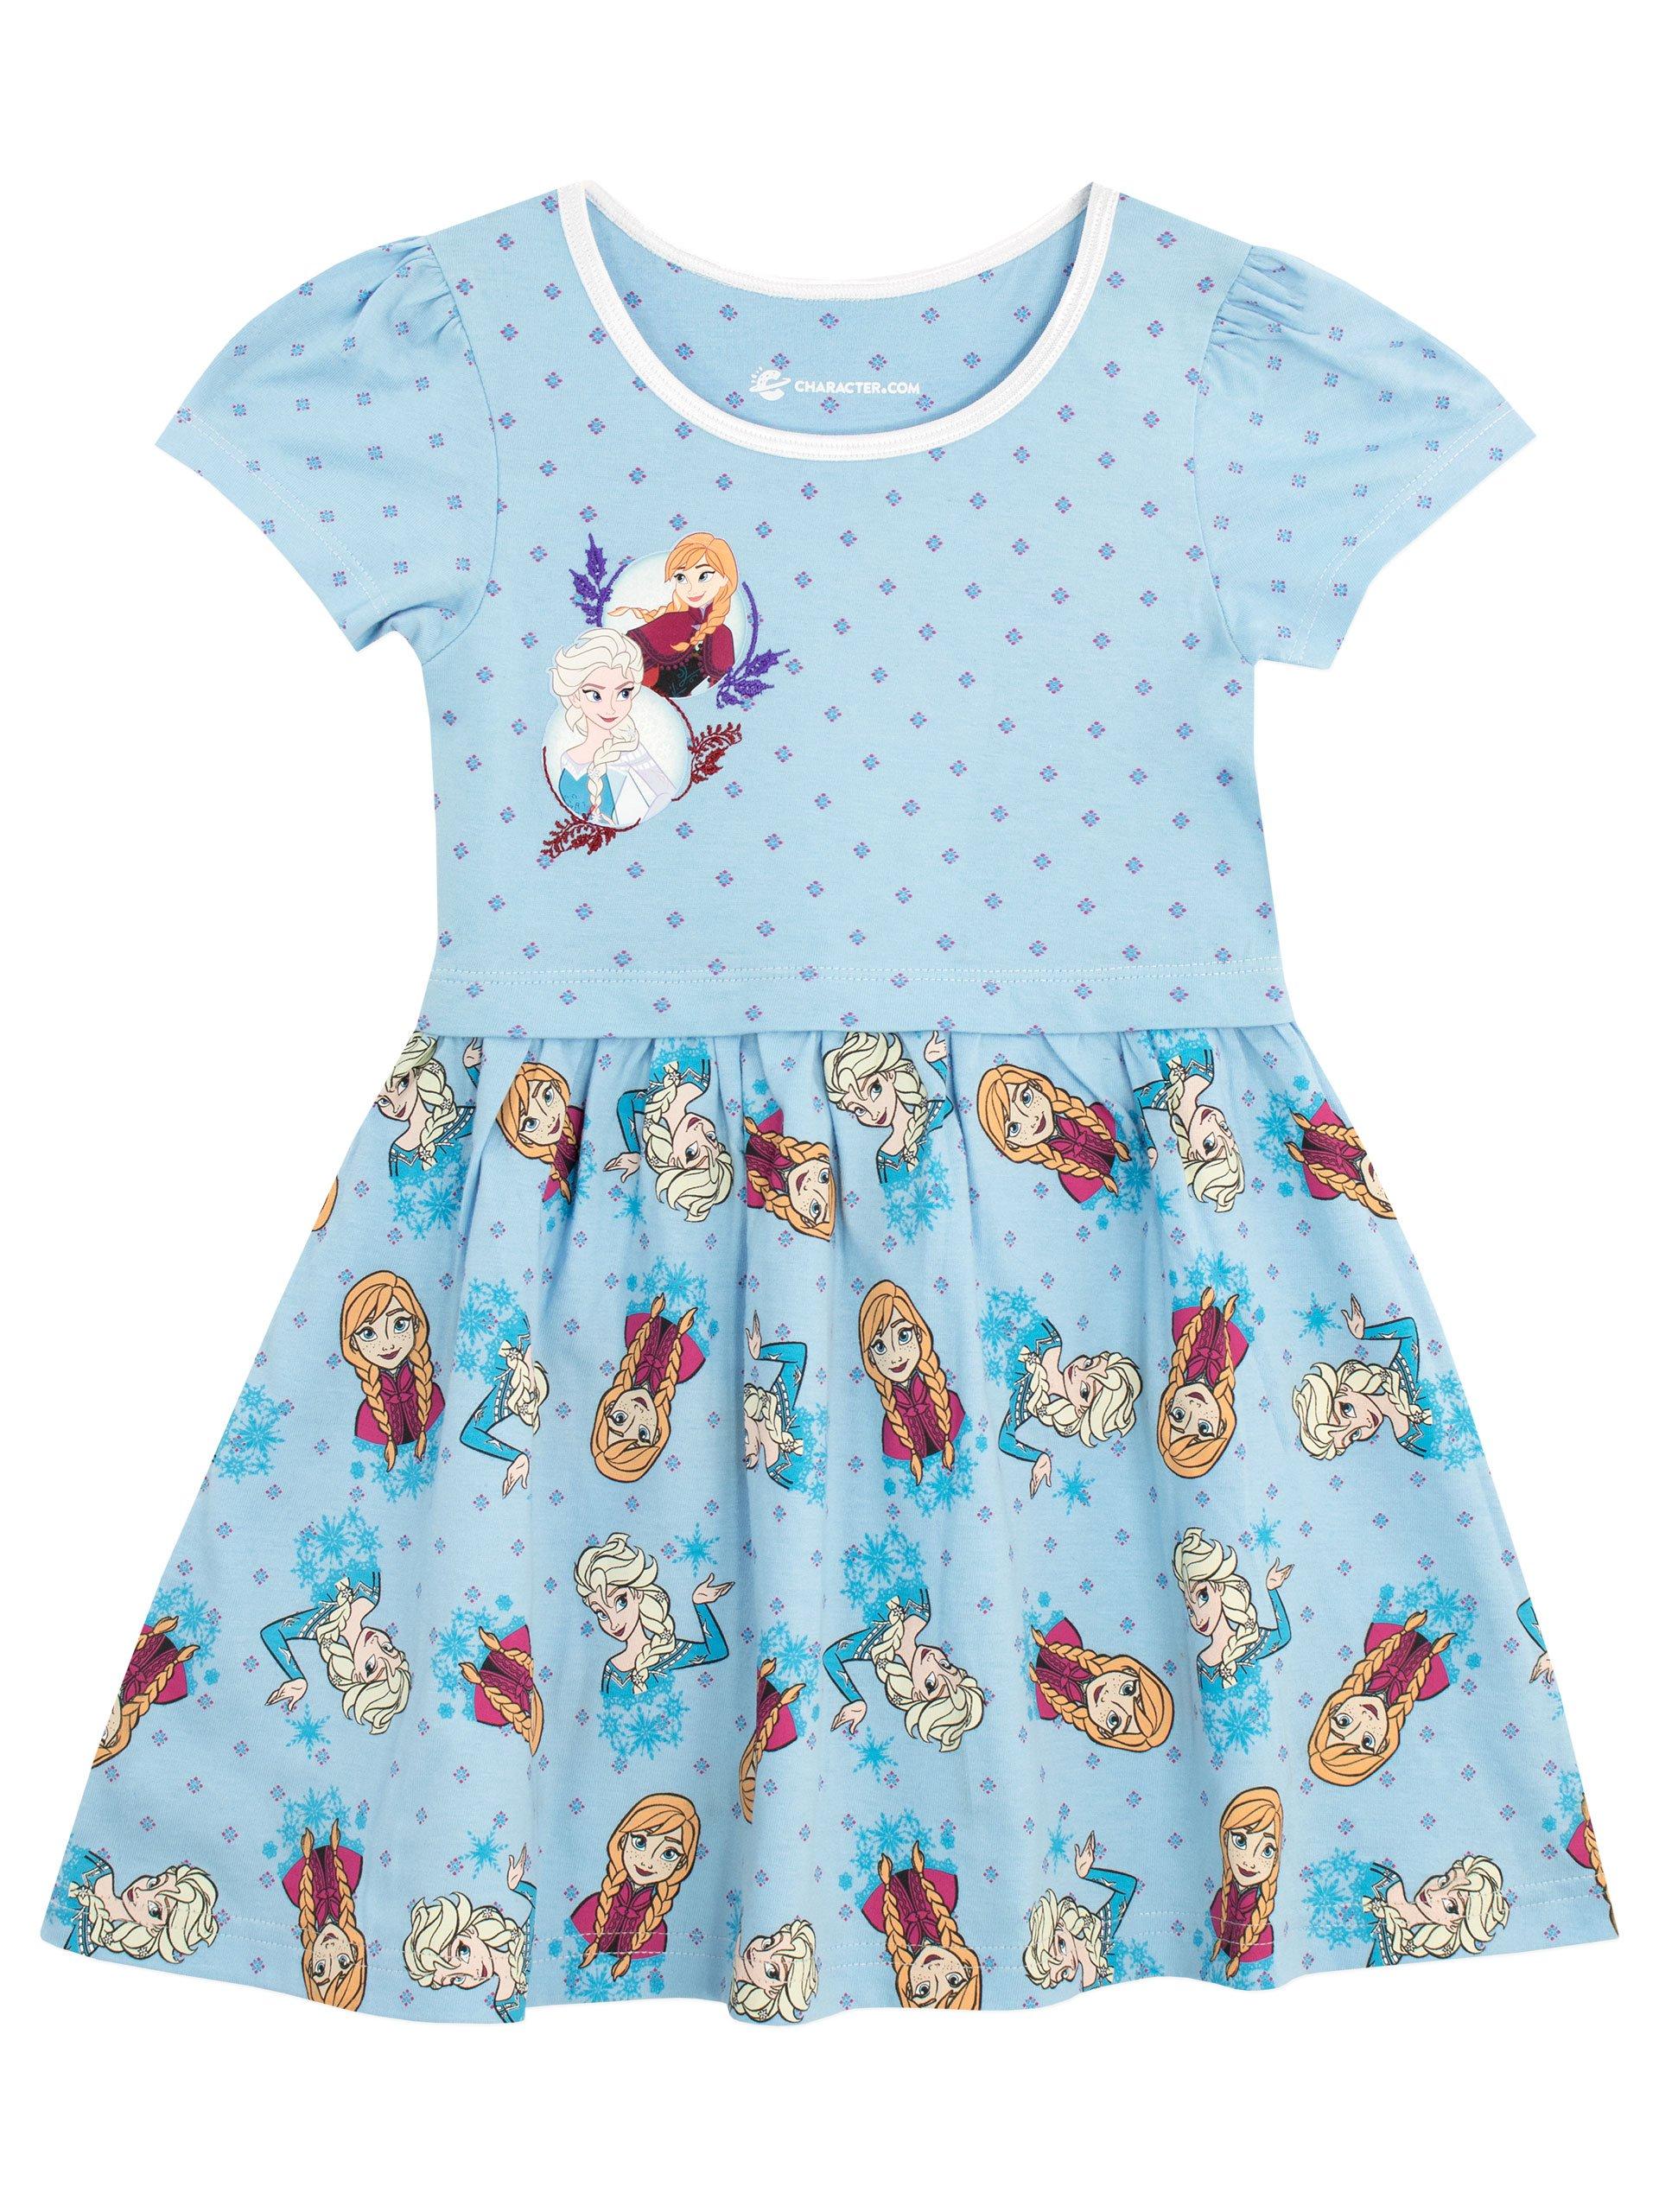 Disney Girls' Frozen Dress Size 4